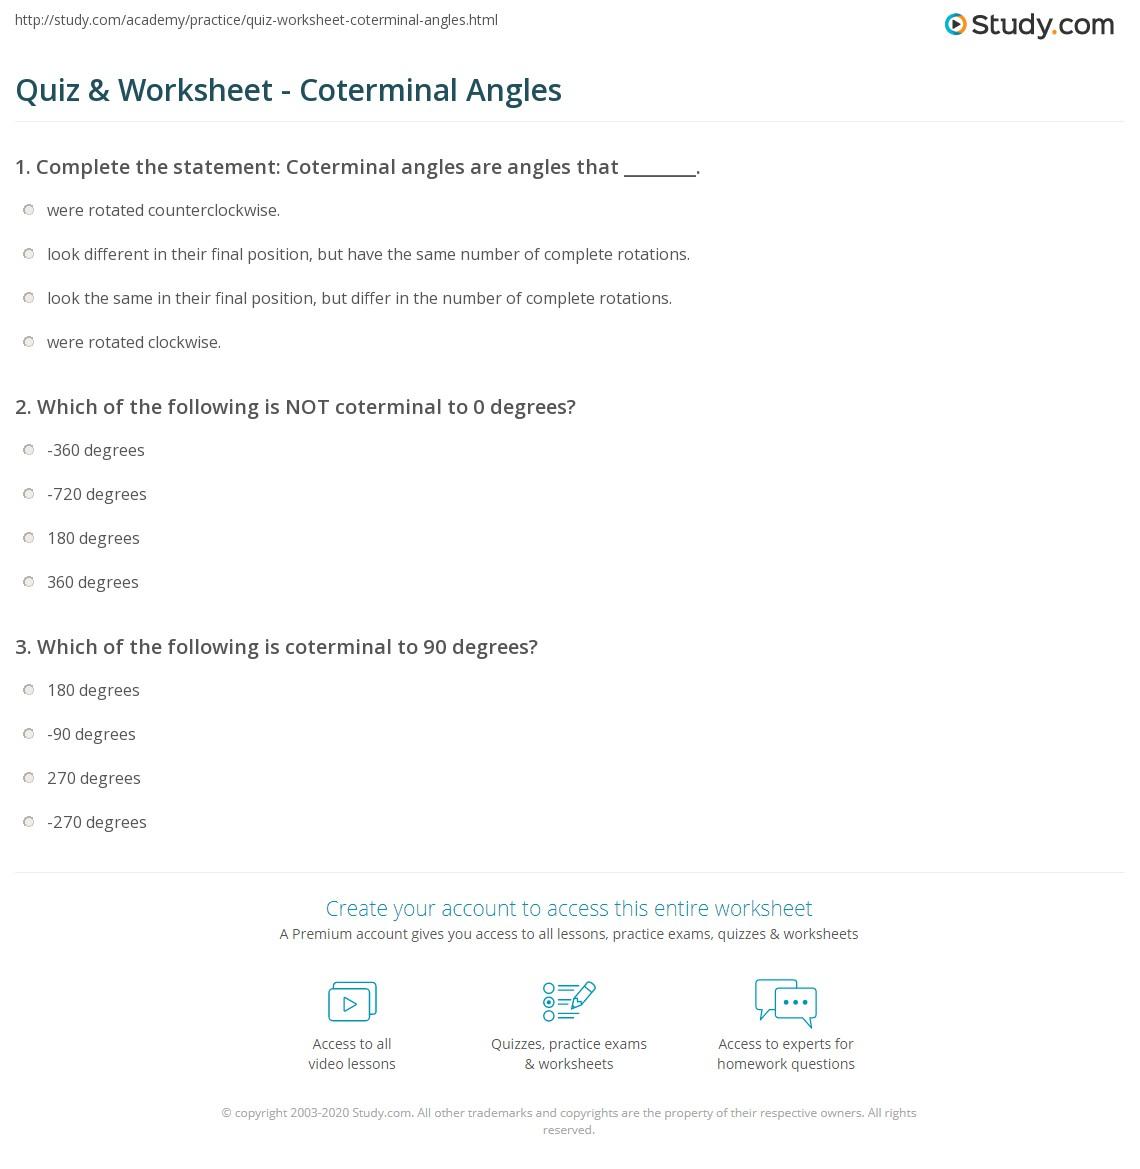 Printables Coterminal Angles Worksheet Messygracebook Thousands Of Printable Activities